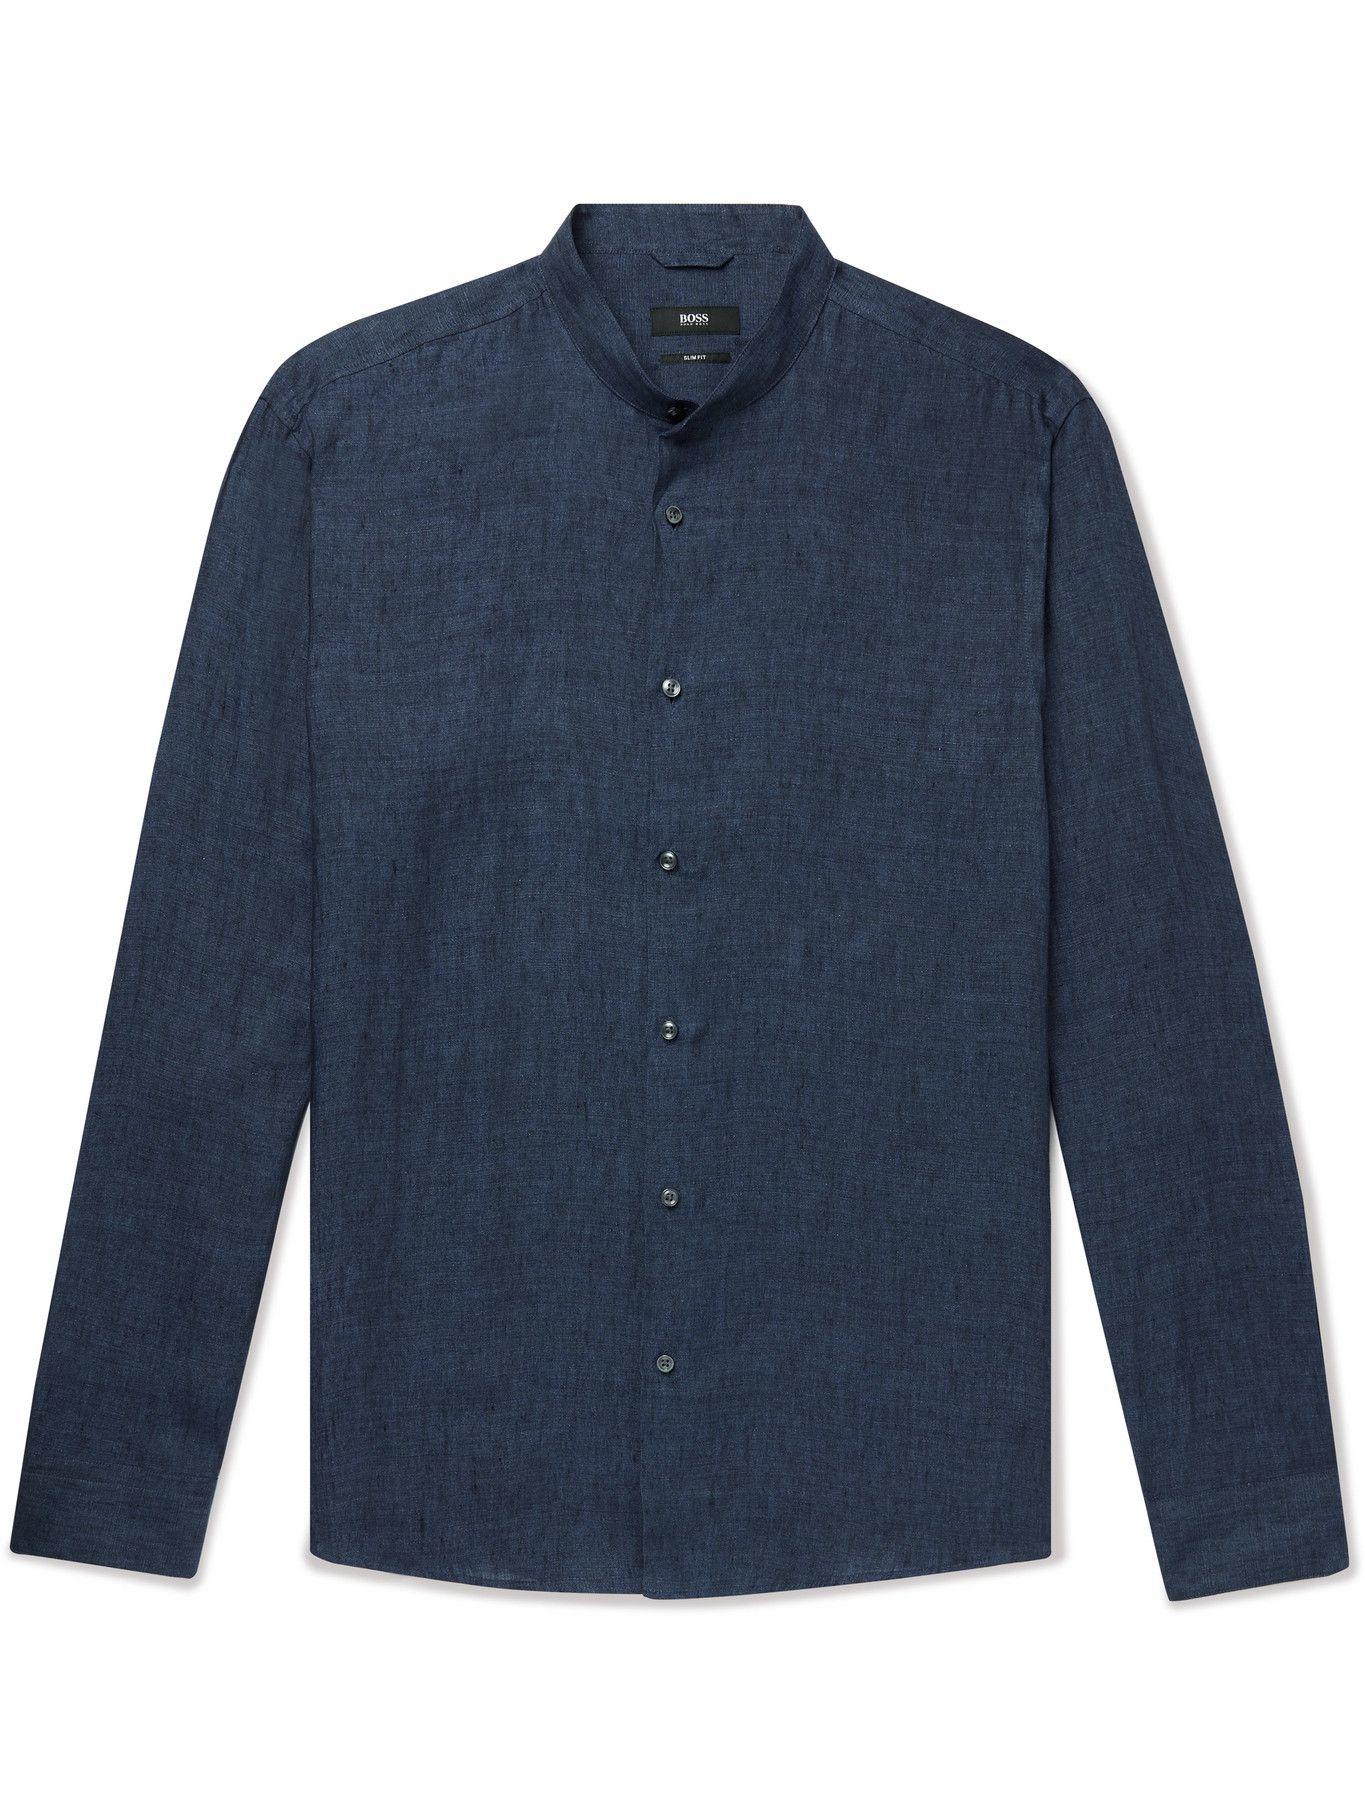 HUGO BOSS - Jordi Slim-Fit Grandad-Collar Linen Shirt - Blue